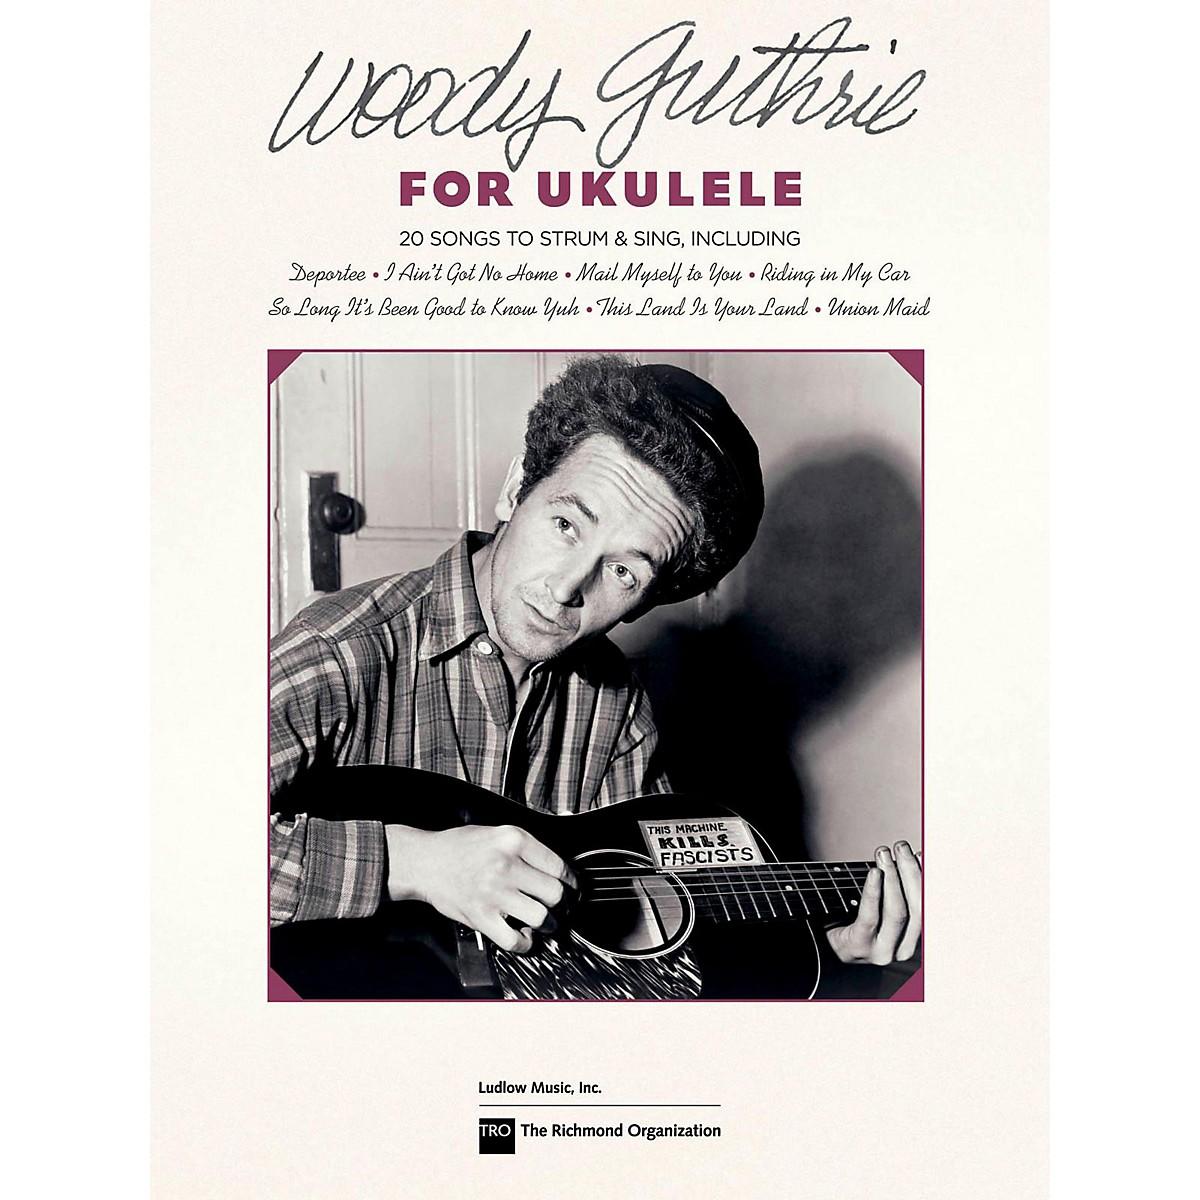 Hal Leonard Woody Guthrie For Ukulele